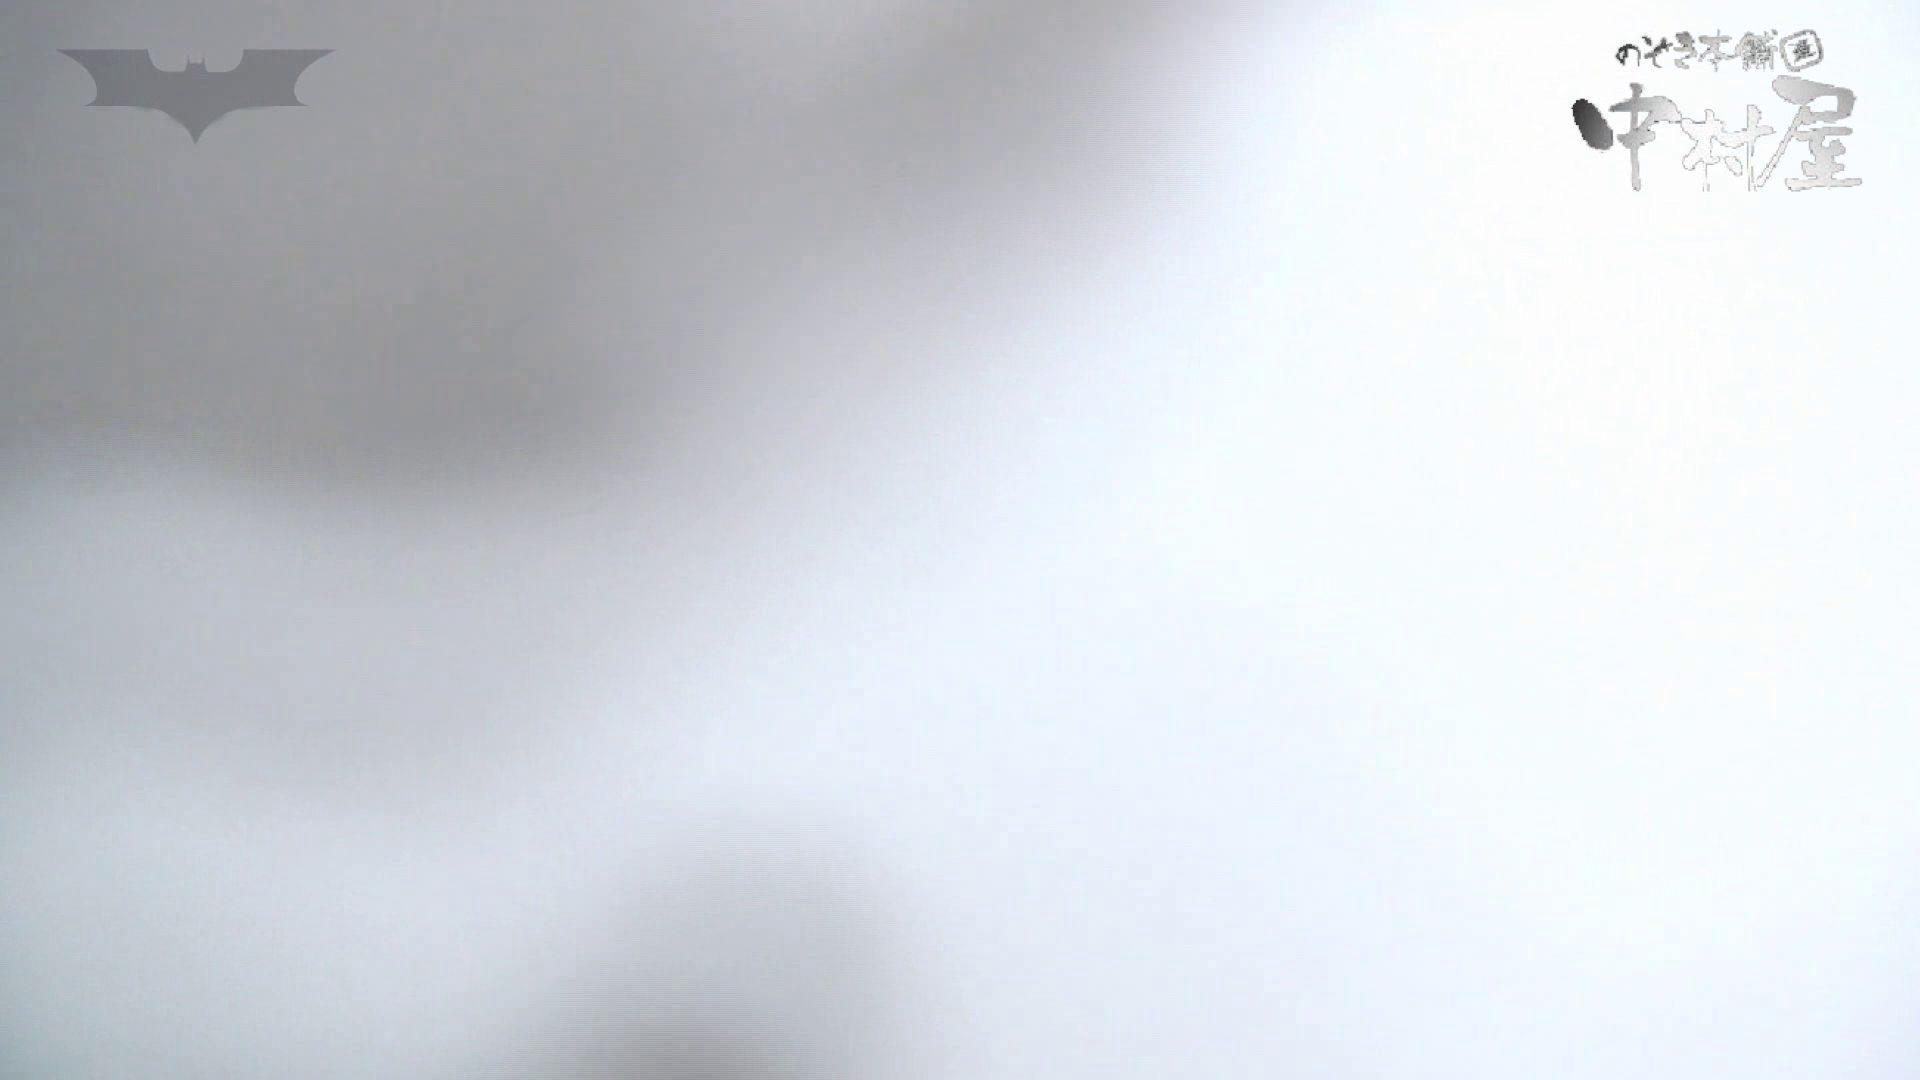 第三体育館潜入撮】第三体育館潜入撮File028 熟女特集!! 乙女エロ画像 ワレメ動画紹介 96PICs 21